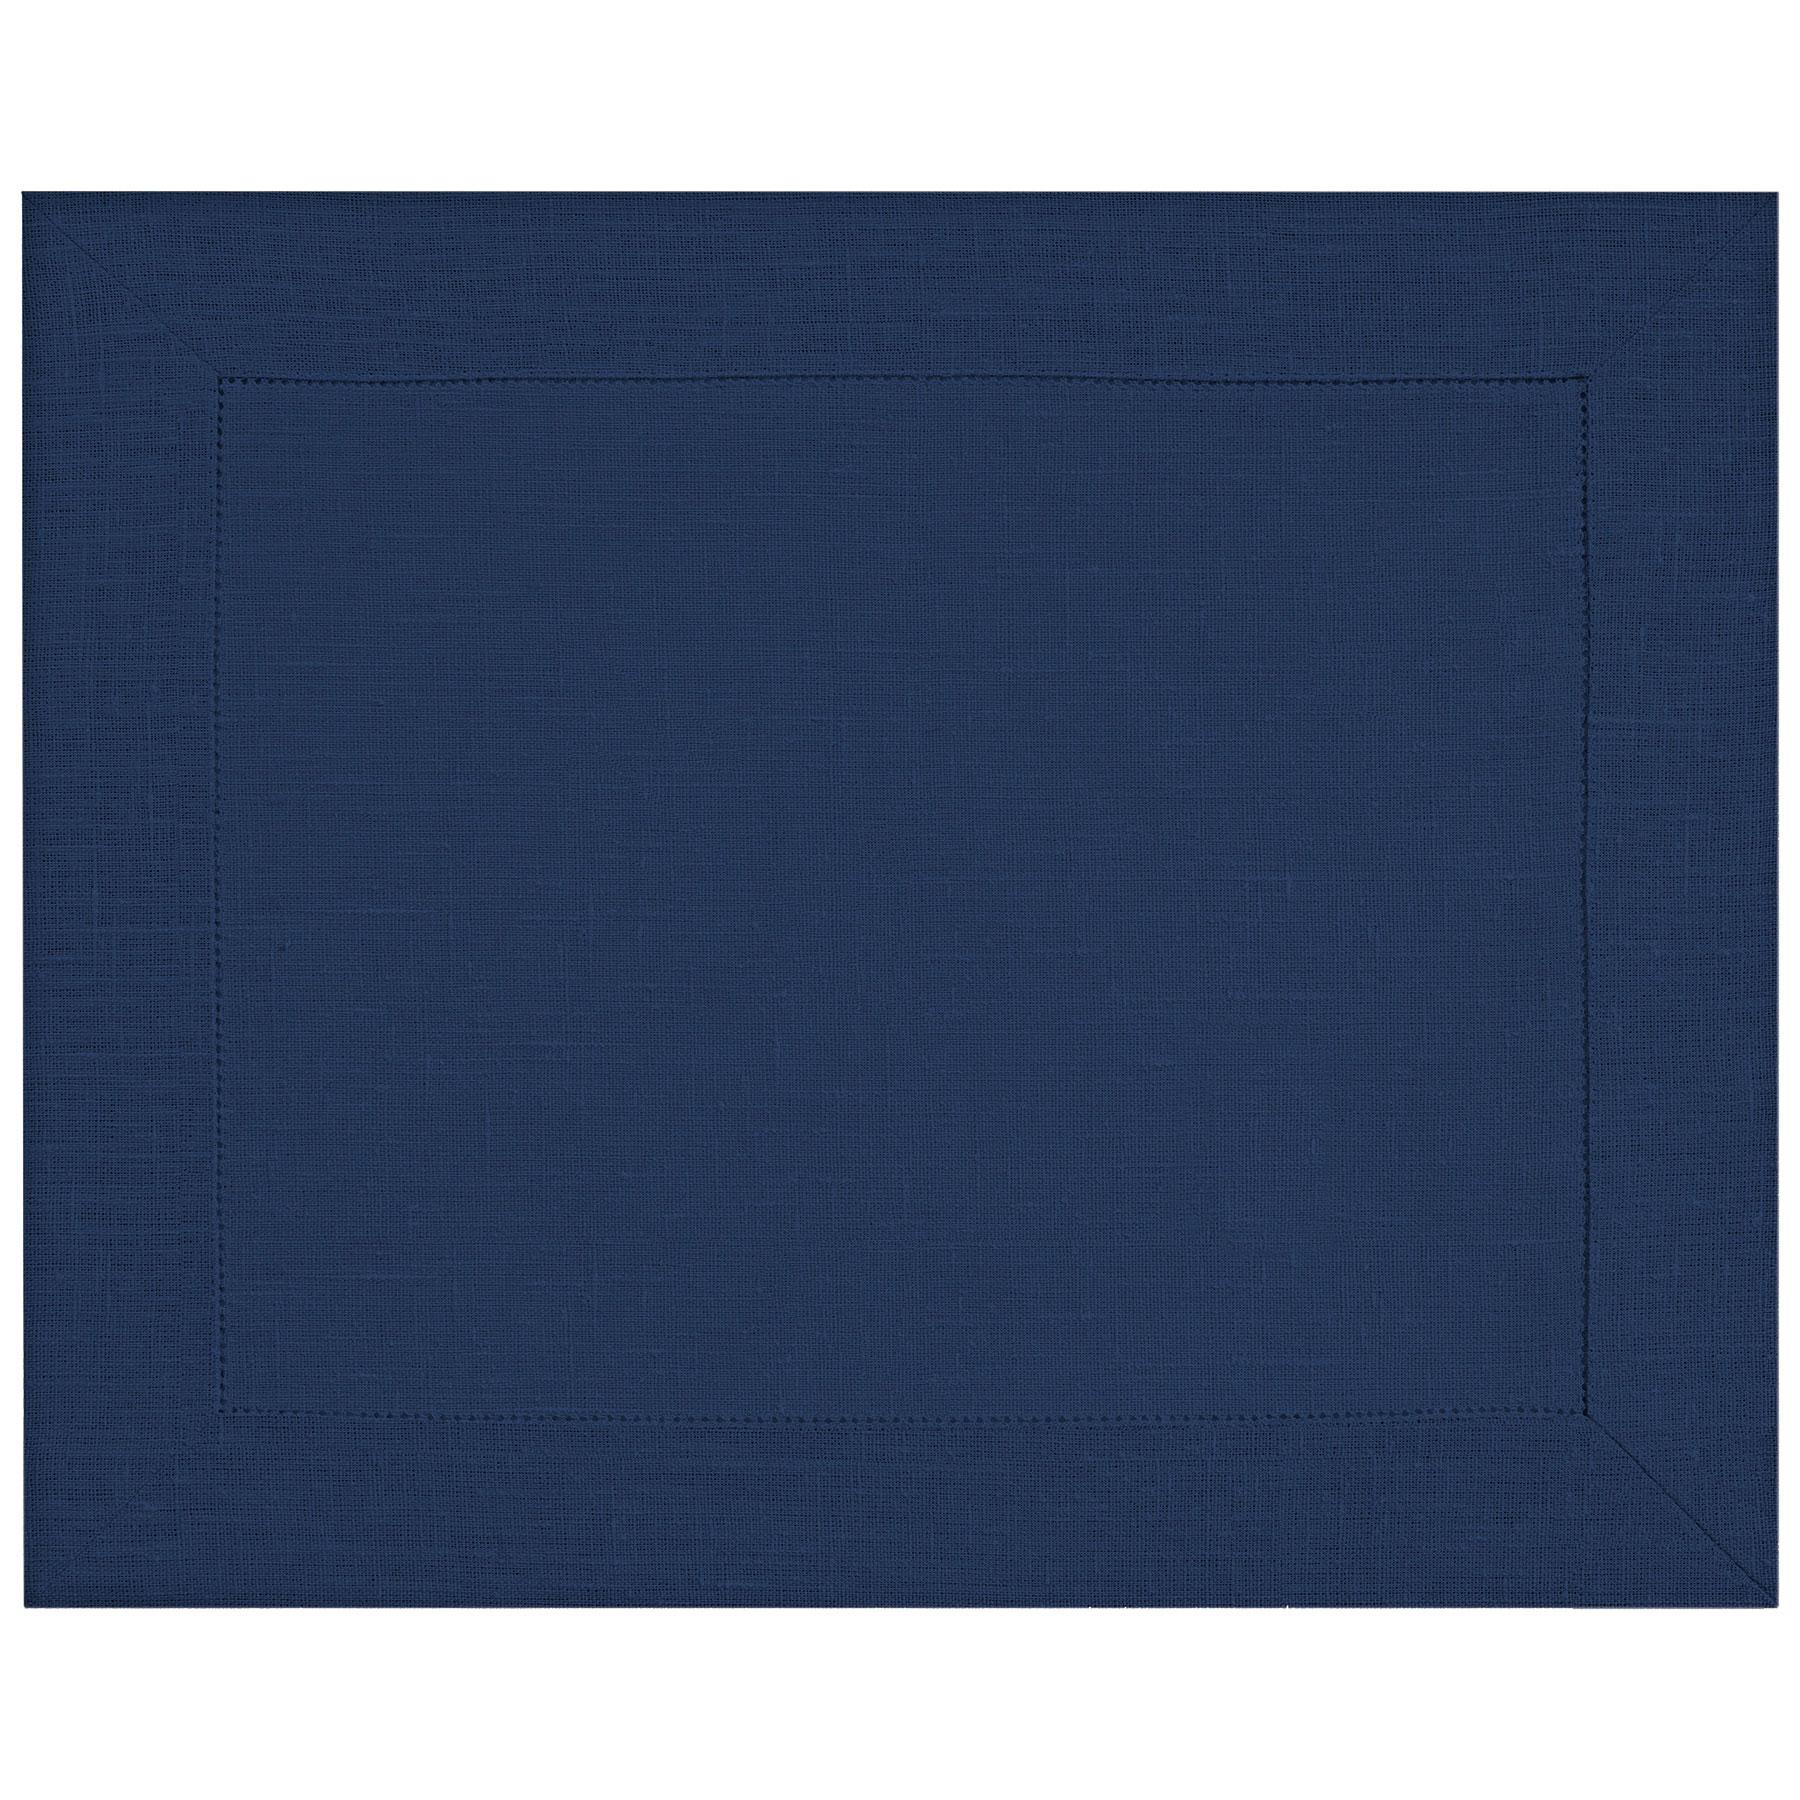 PLACEMAT <br />dark blue